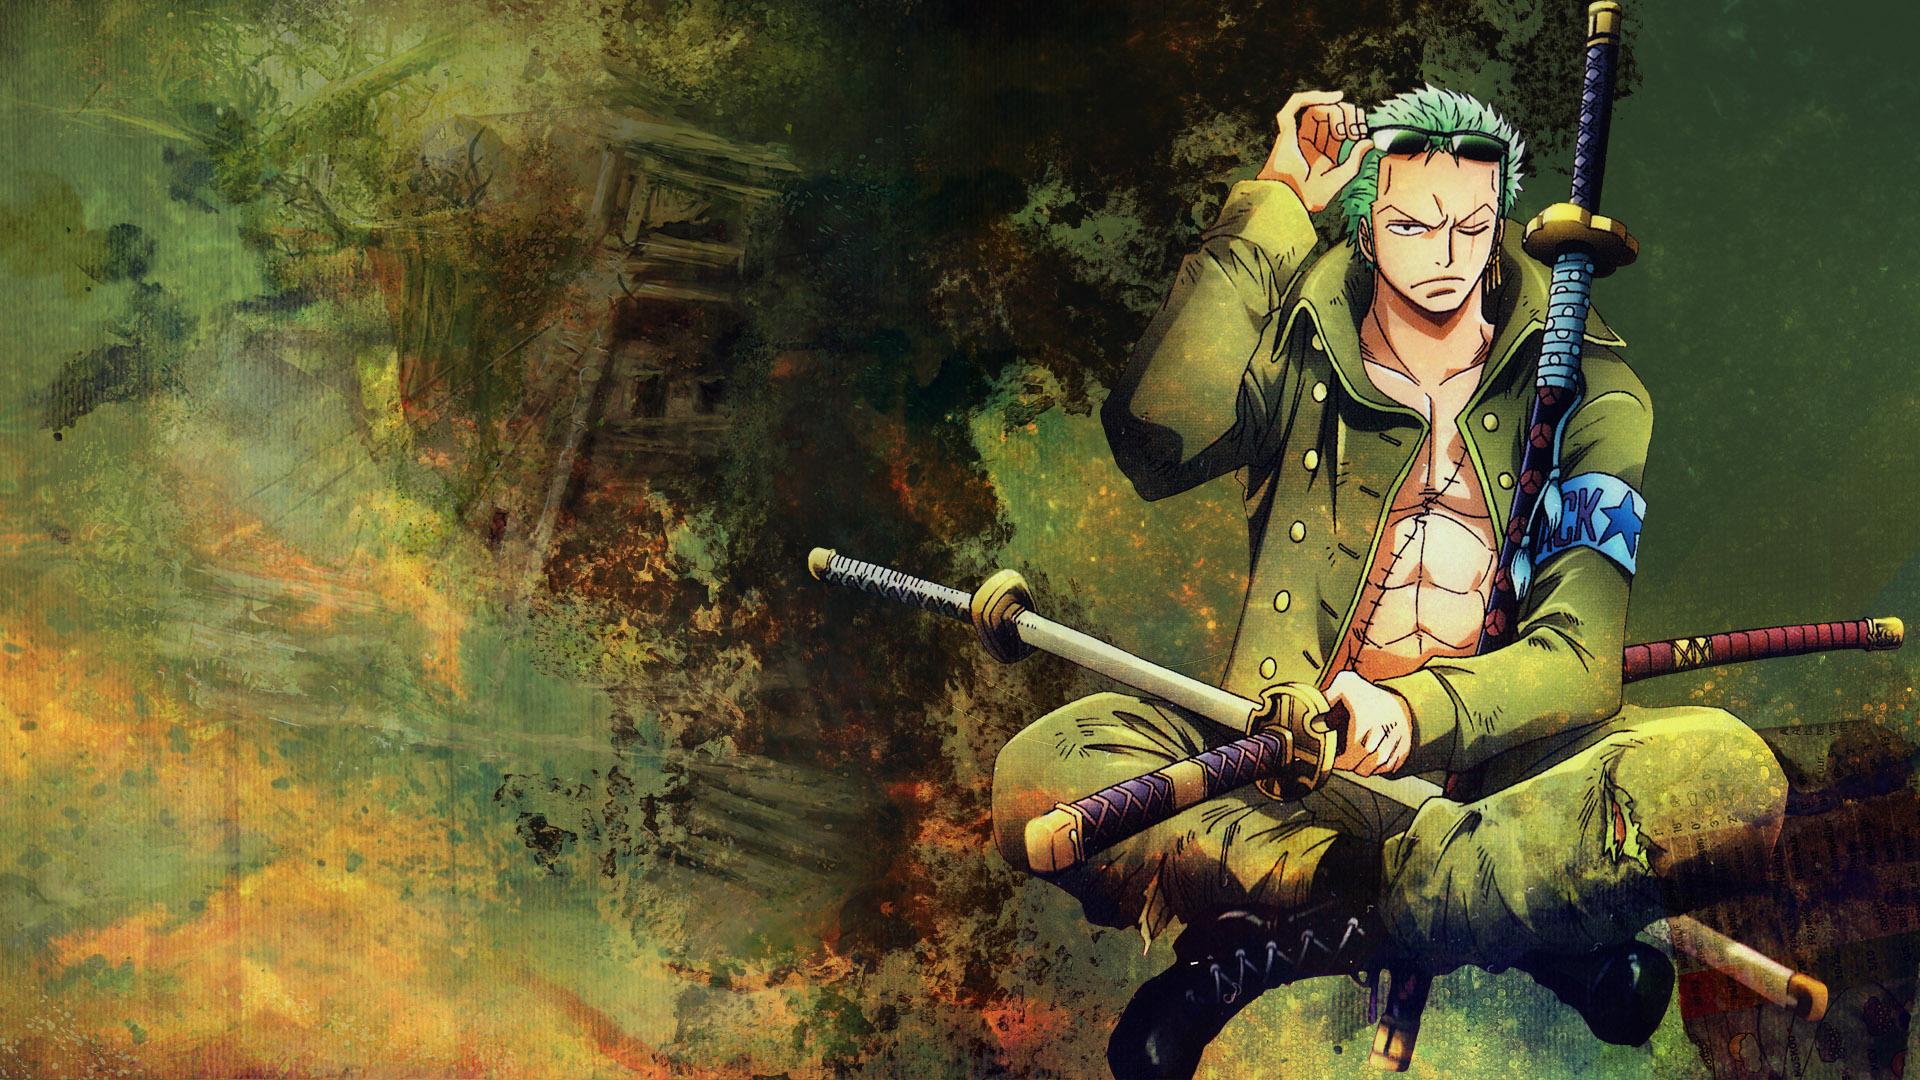 Desktop Wallpaper Roronoa Zoro One Piece Anime Boy Hd Image